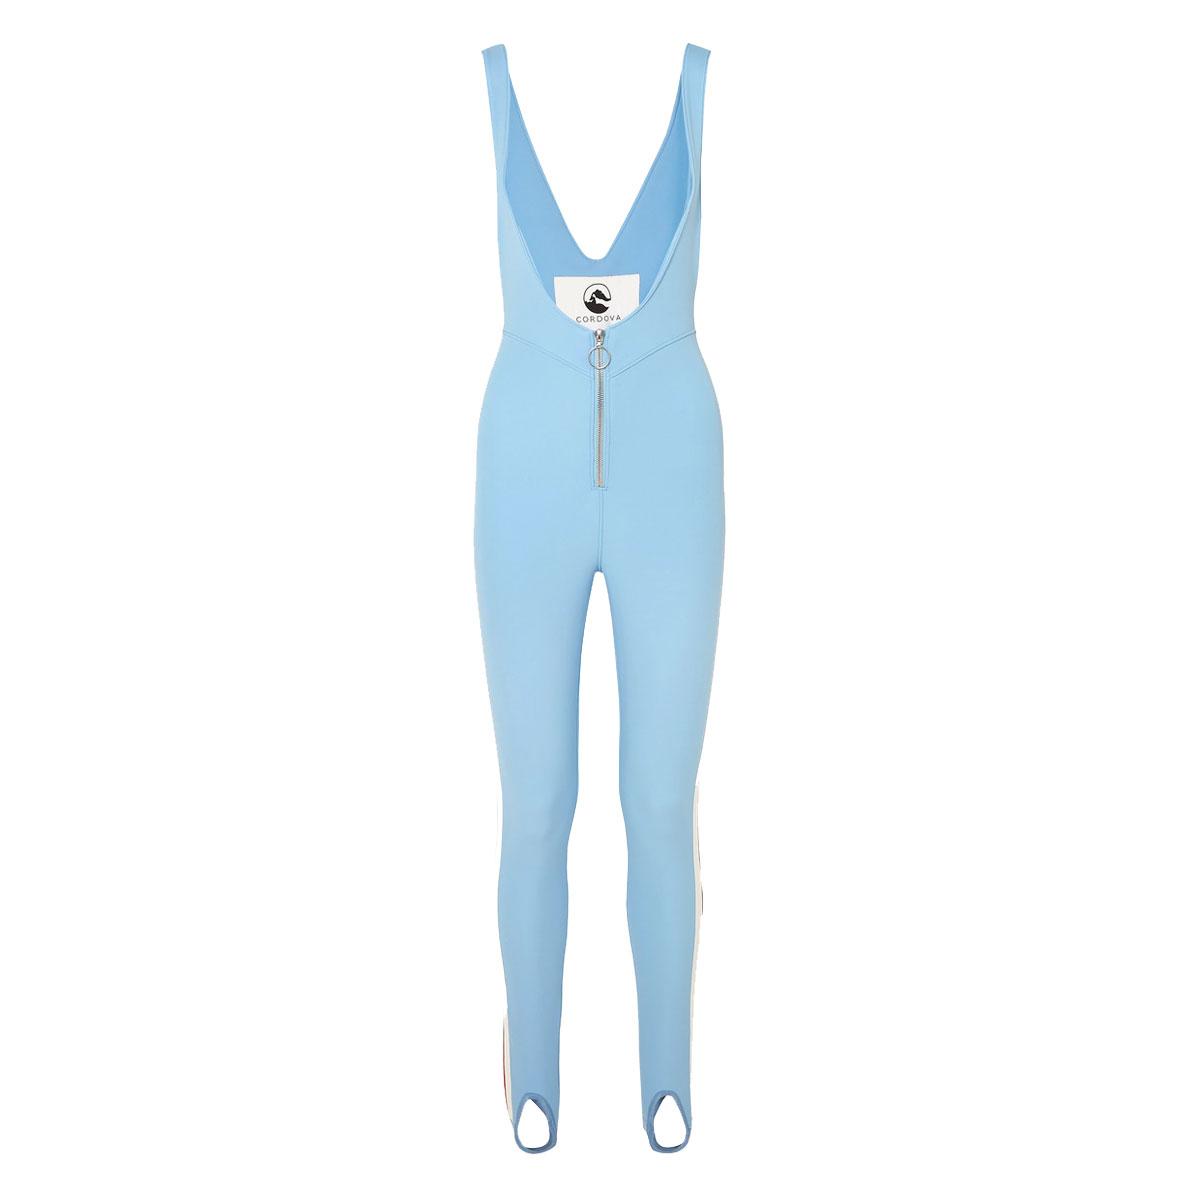 cordova the vail striped stirrup stretch ski suit